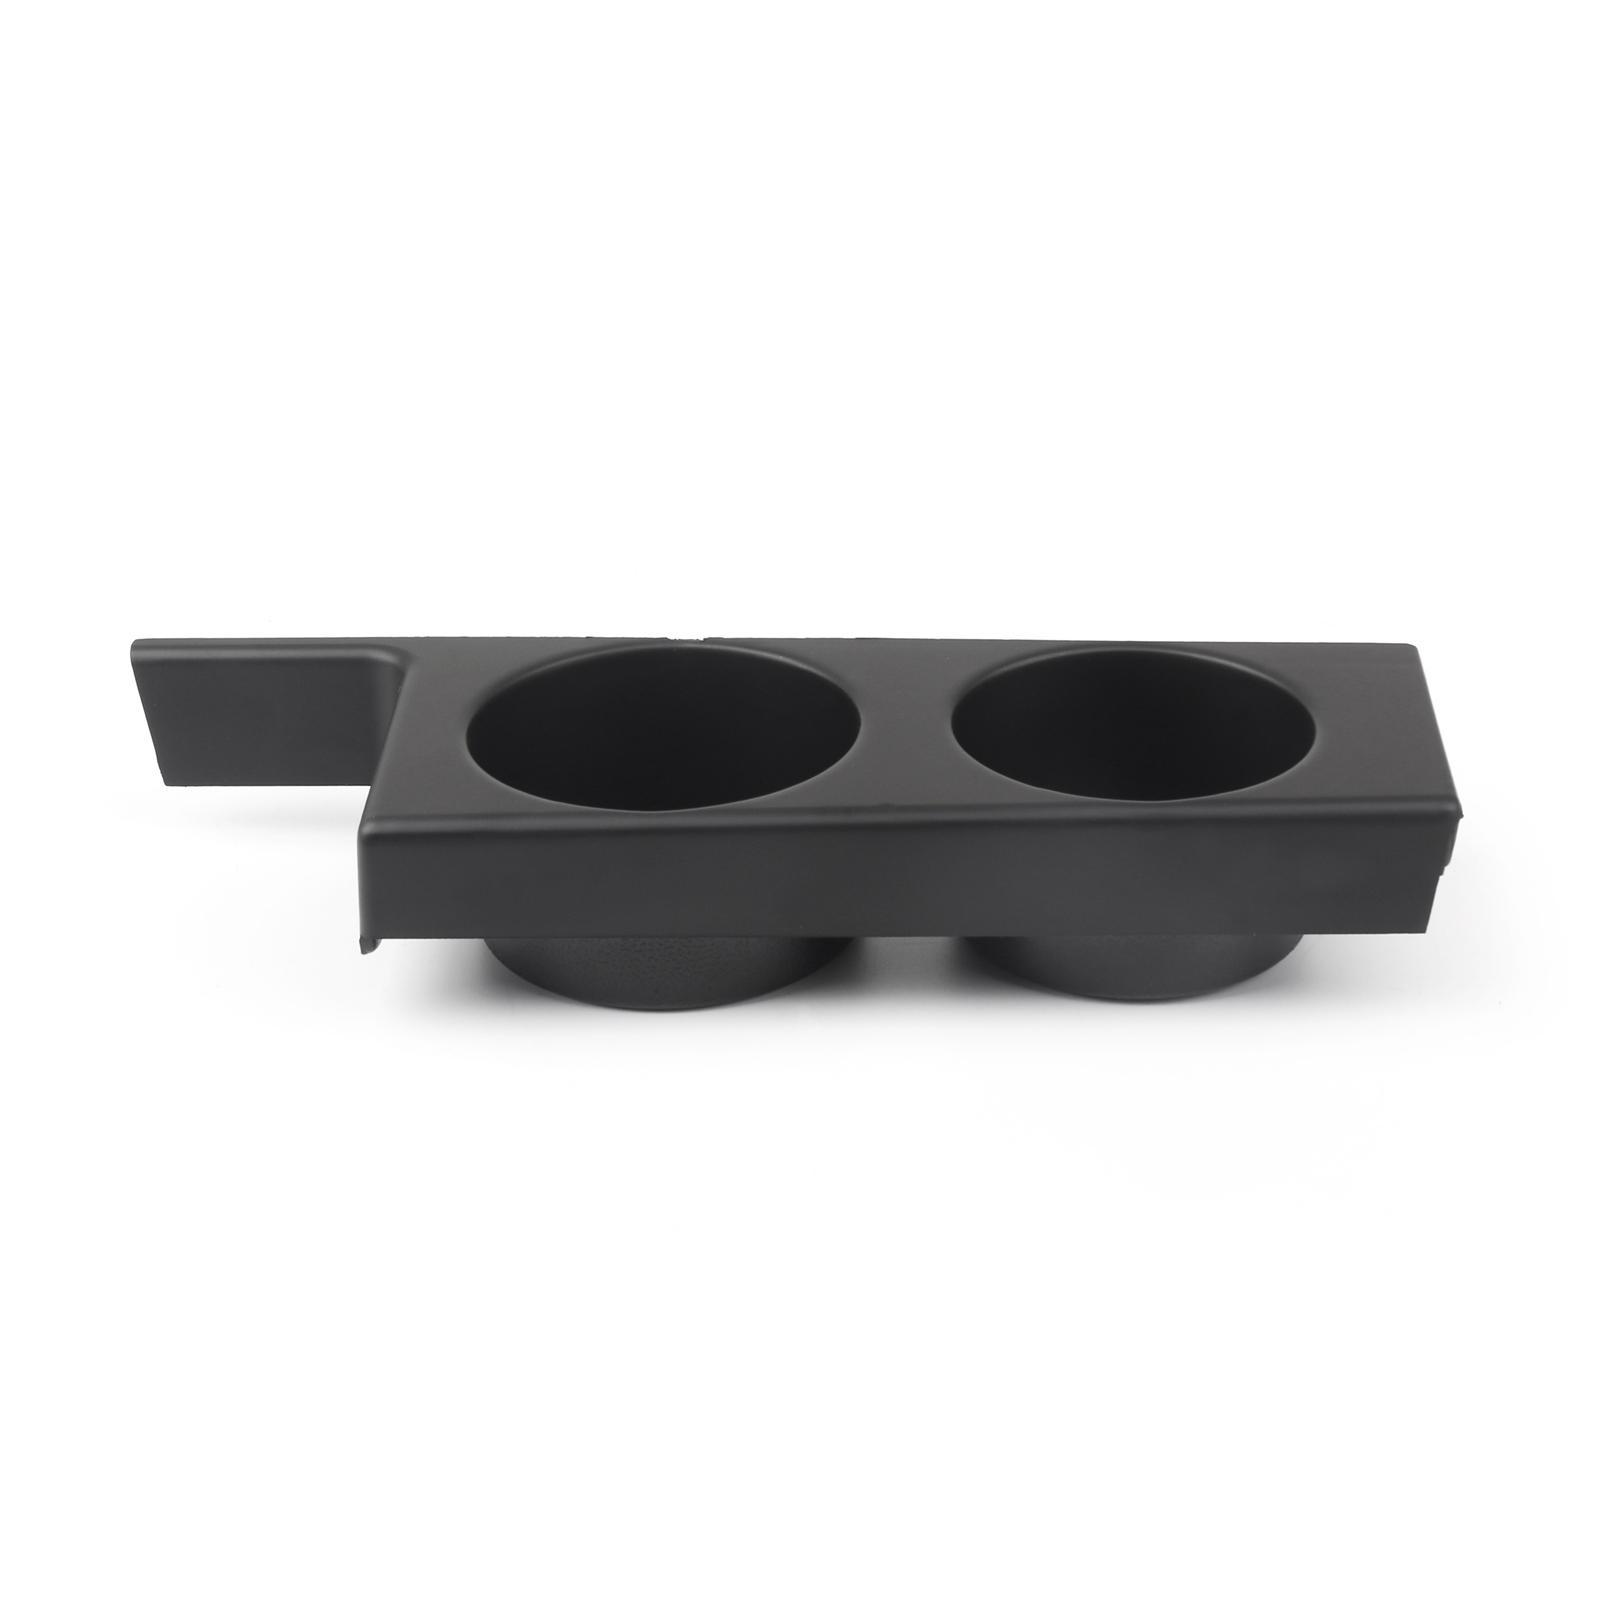 For Bmw E39 5 Series Premium Front Cup Holder 97-03 525I 528I 530I 540I M5 Black